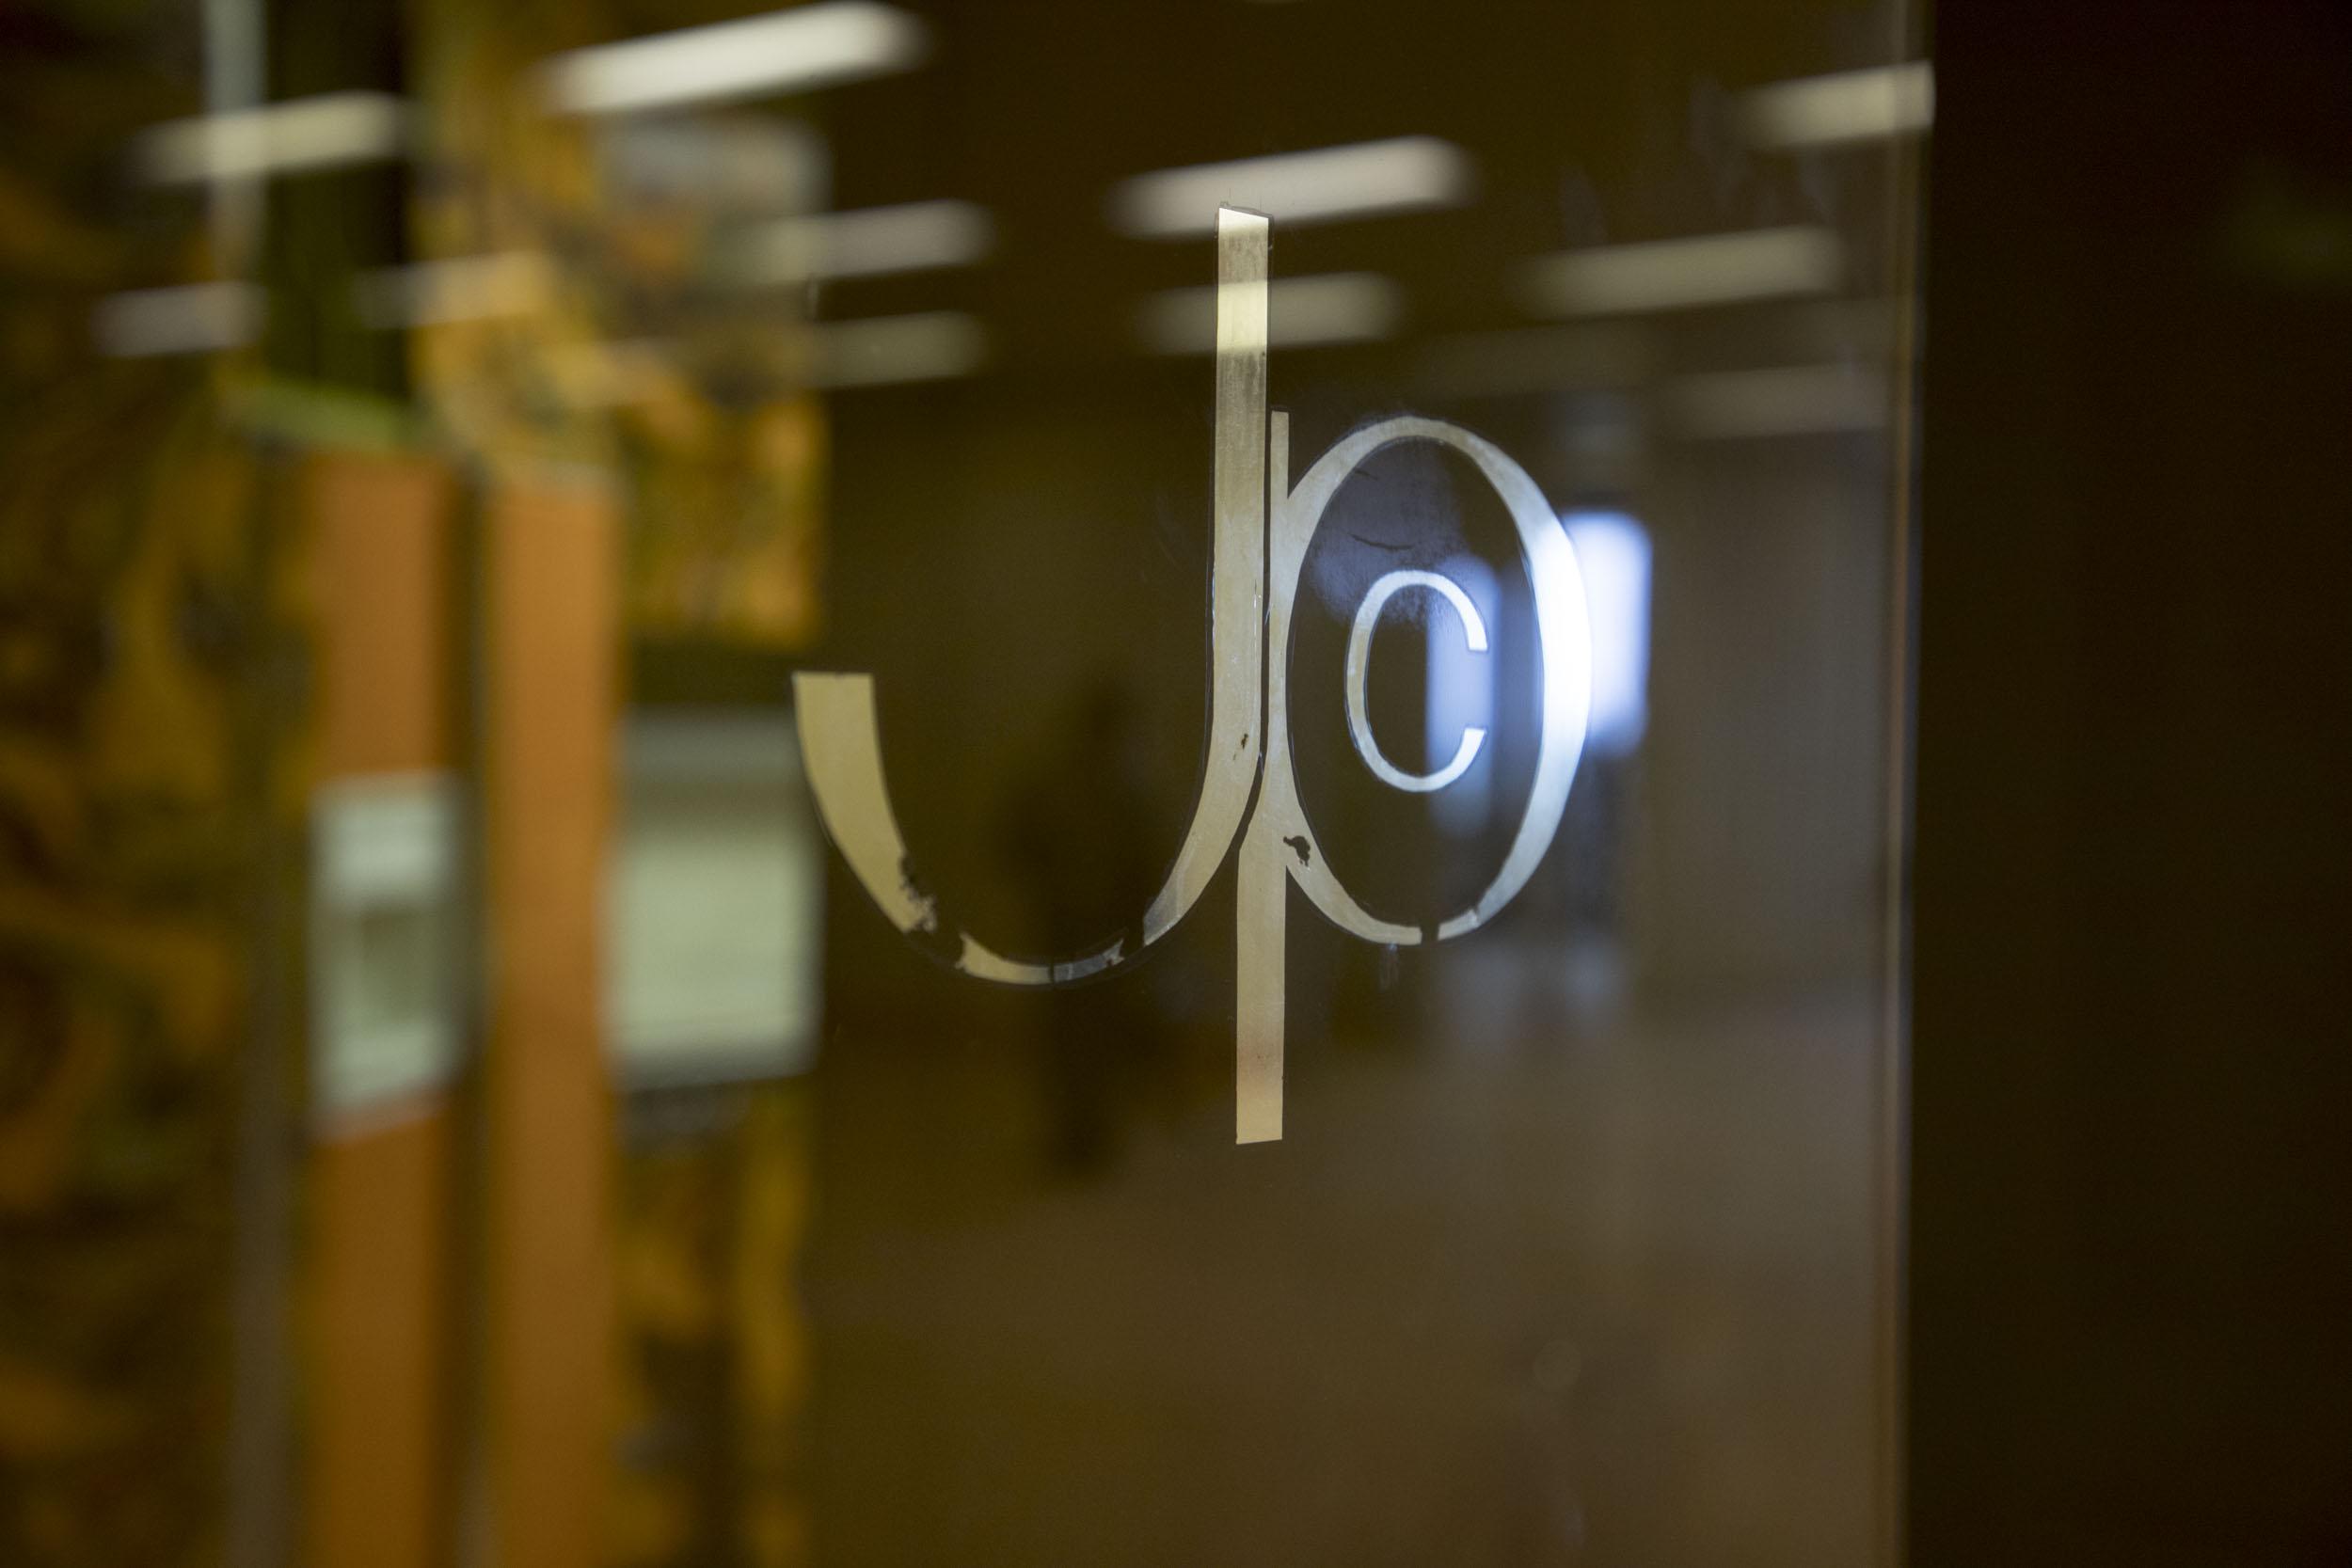 The original Johnson Publishing Company logo. (Andrew Gill/WBEZ)